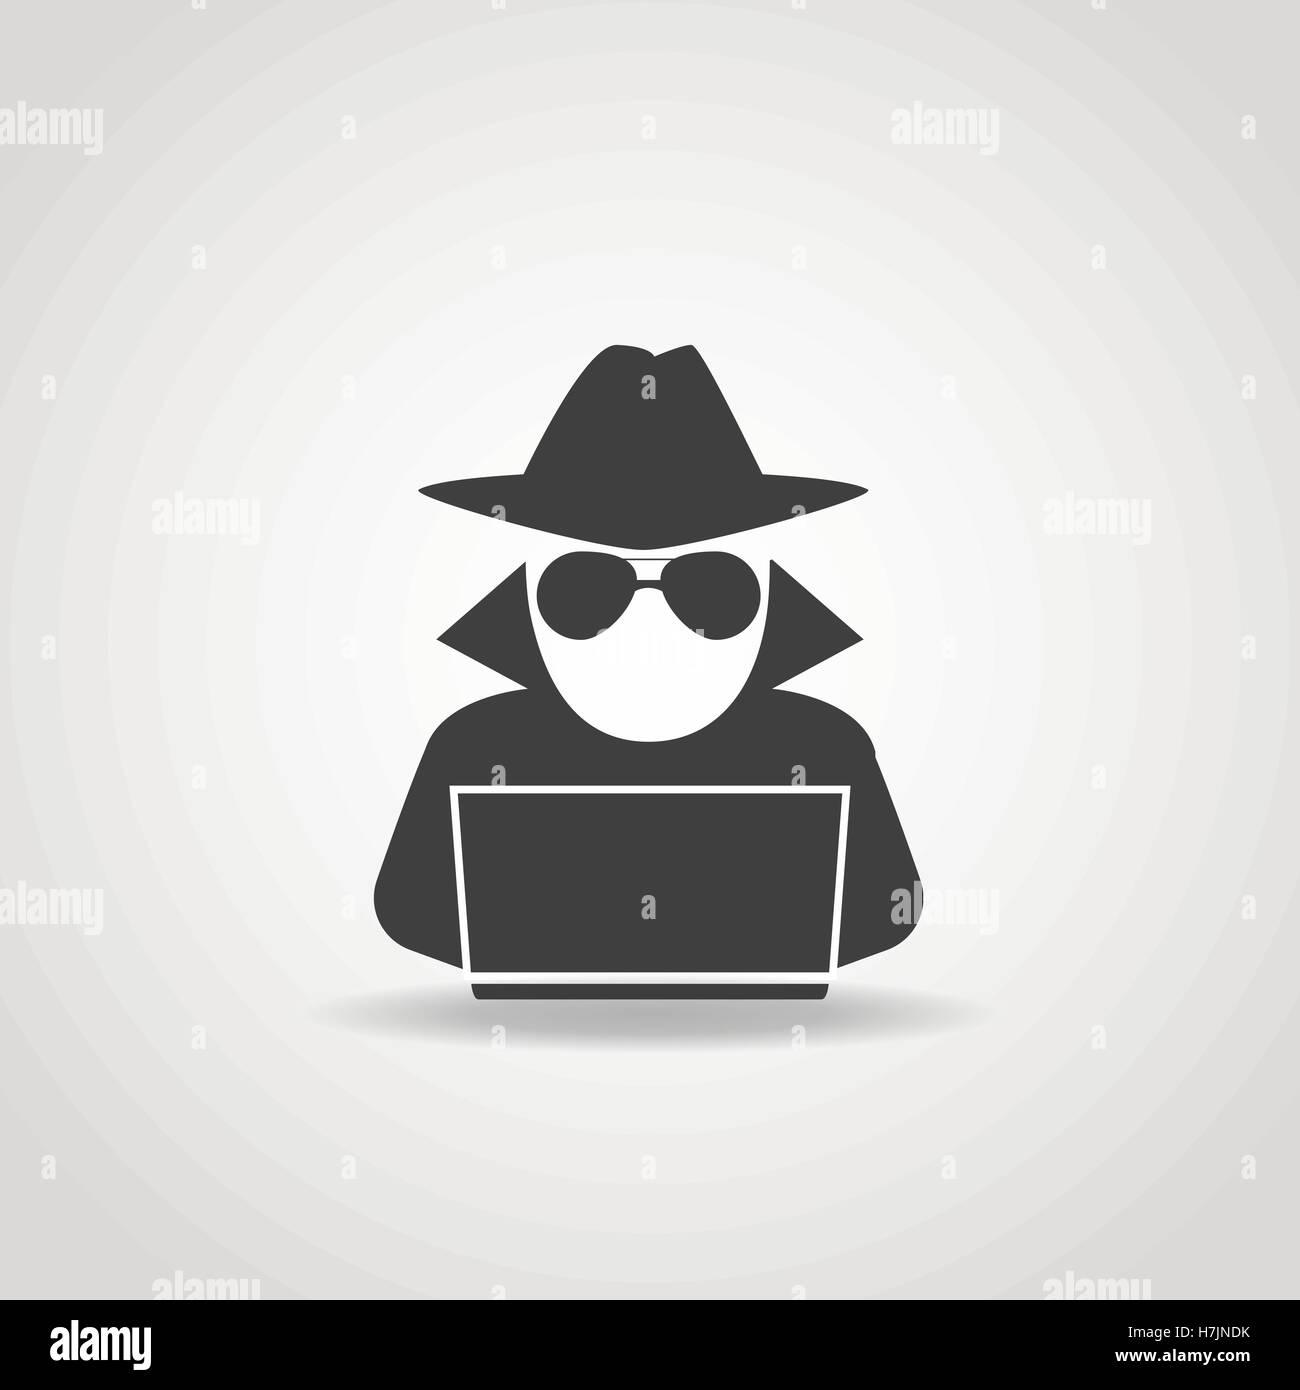 Black Hat Hacker Vector Vectors Stock Photos & Black Hat